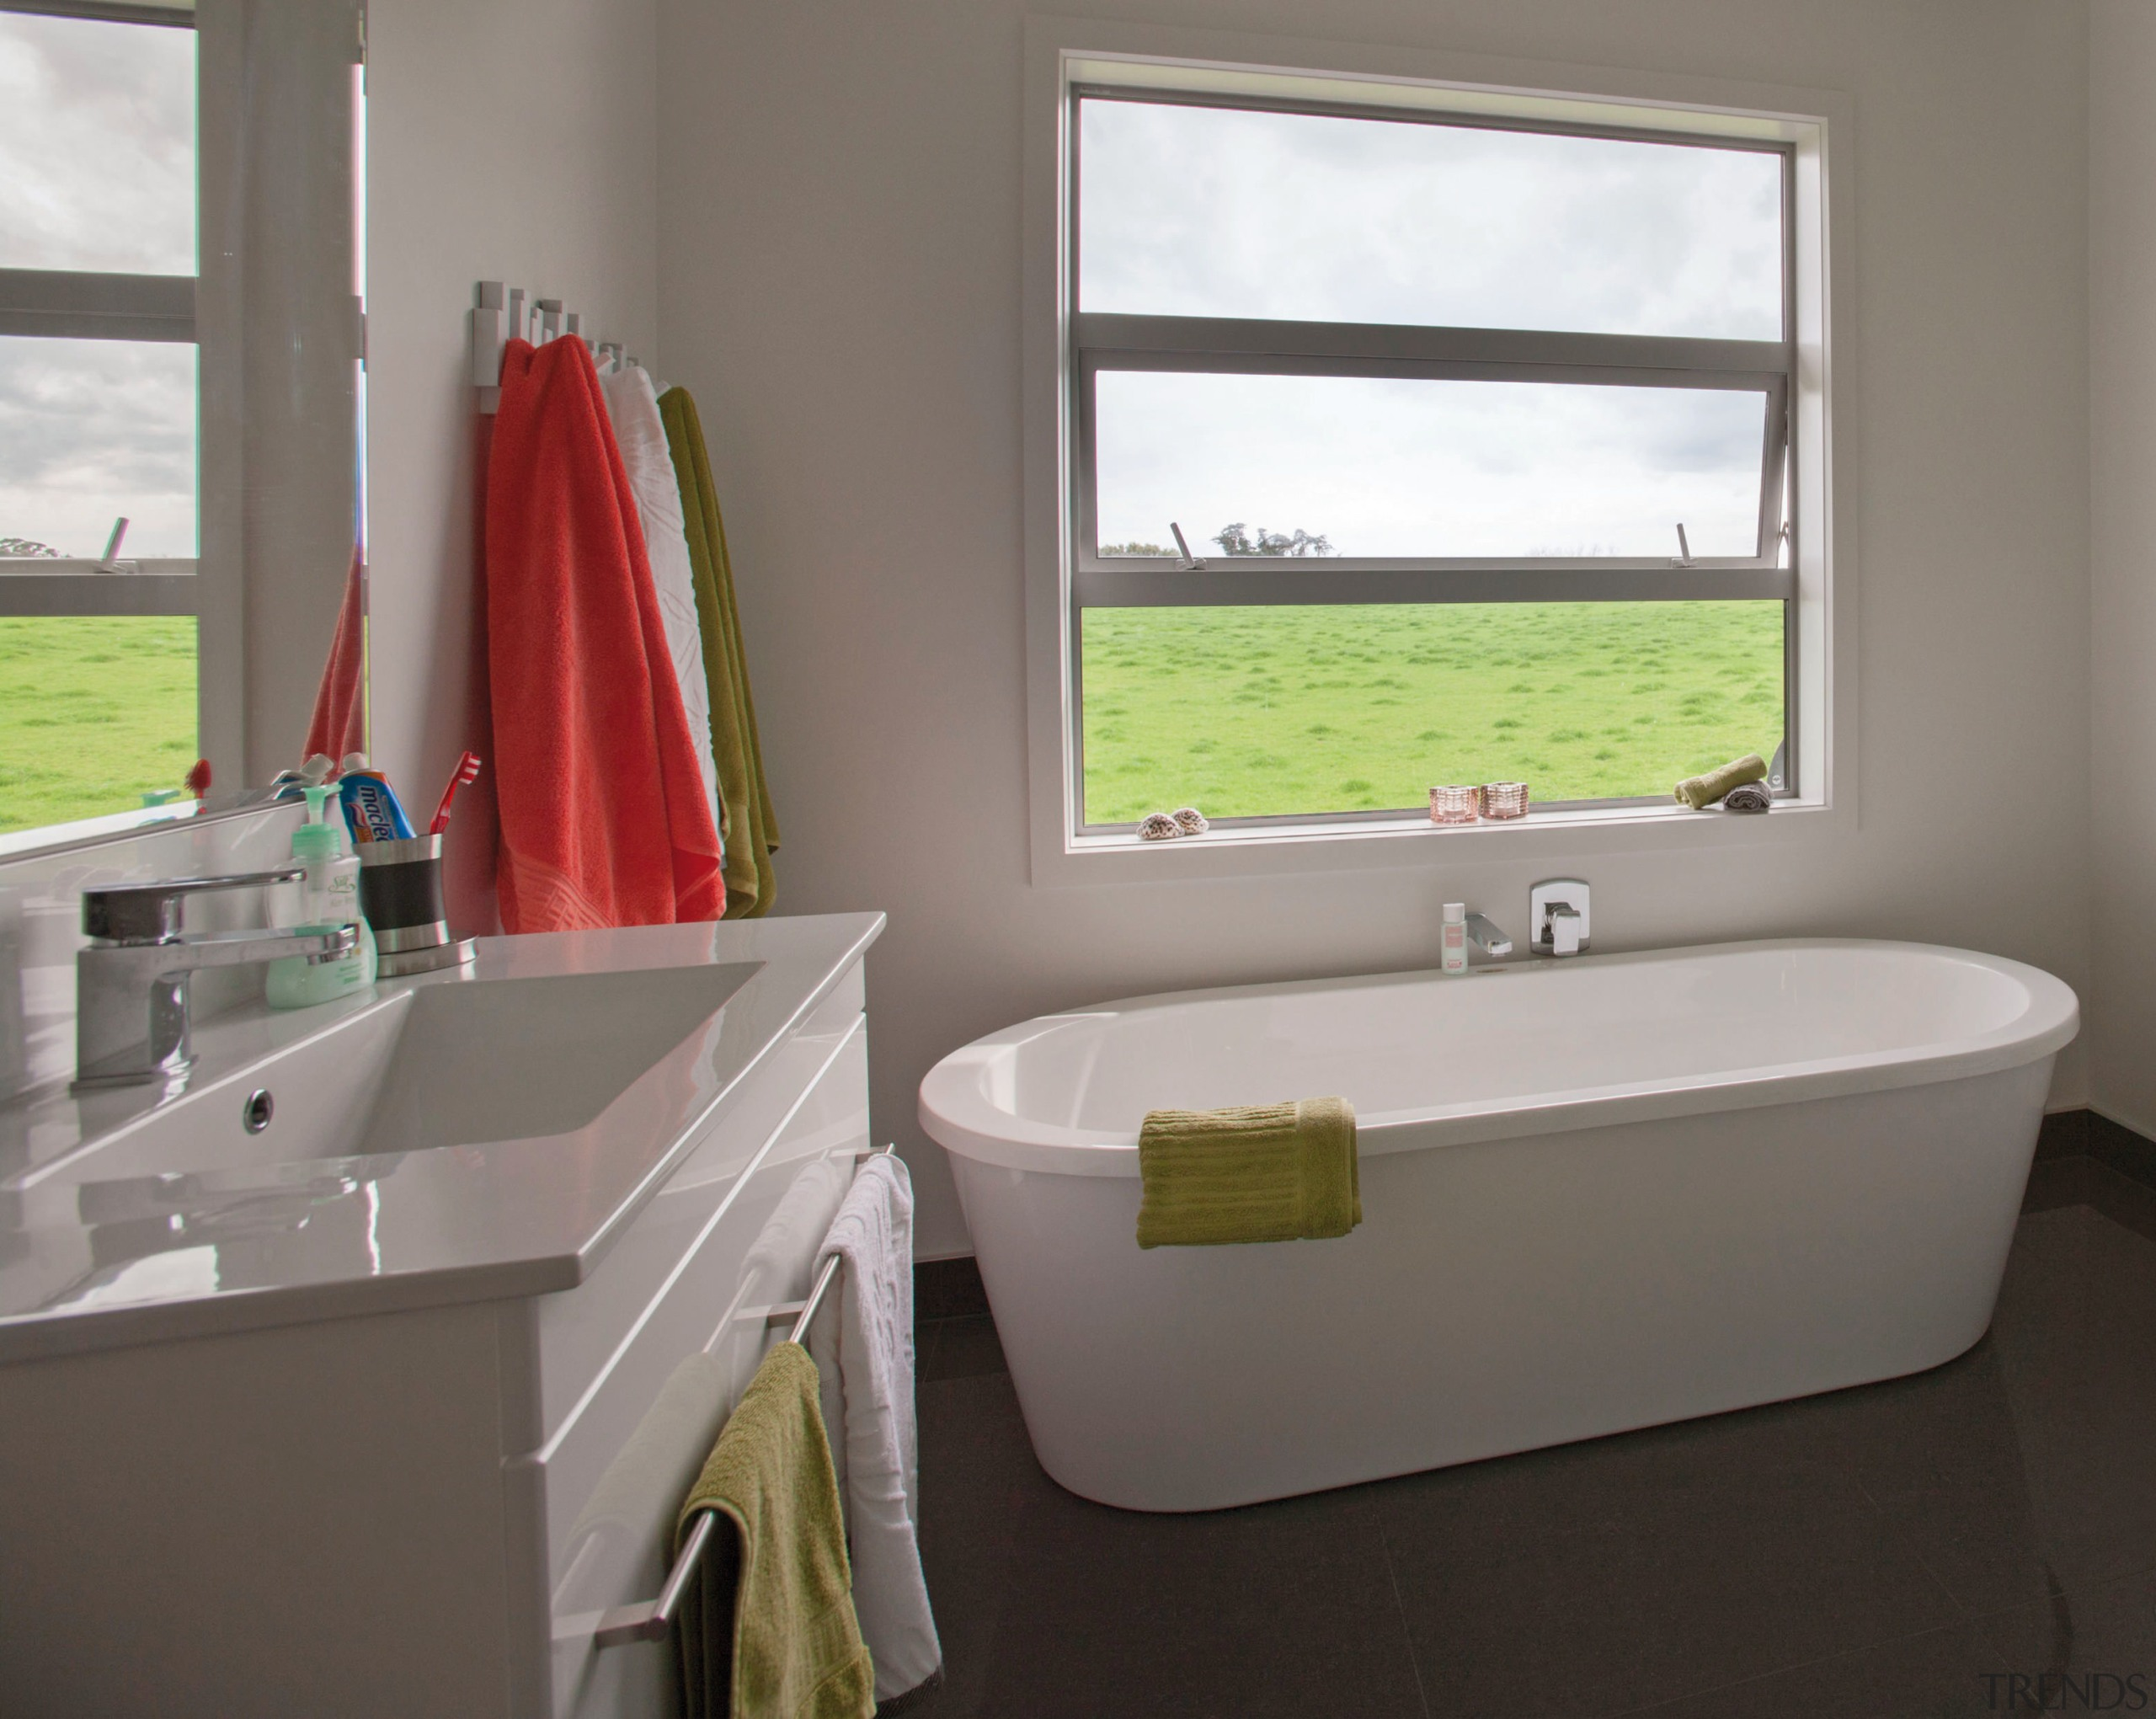 This master suite in a GJ Gardner Homes bathroom, bathroom accessory, interior design, plumbing fixture, room, sink, window, gray